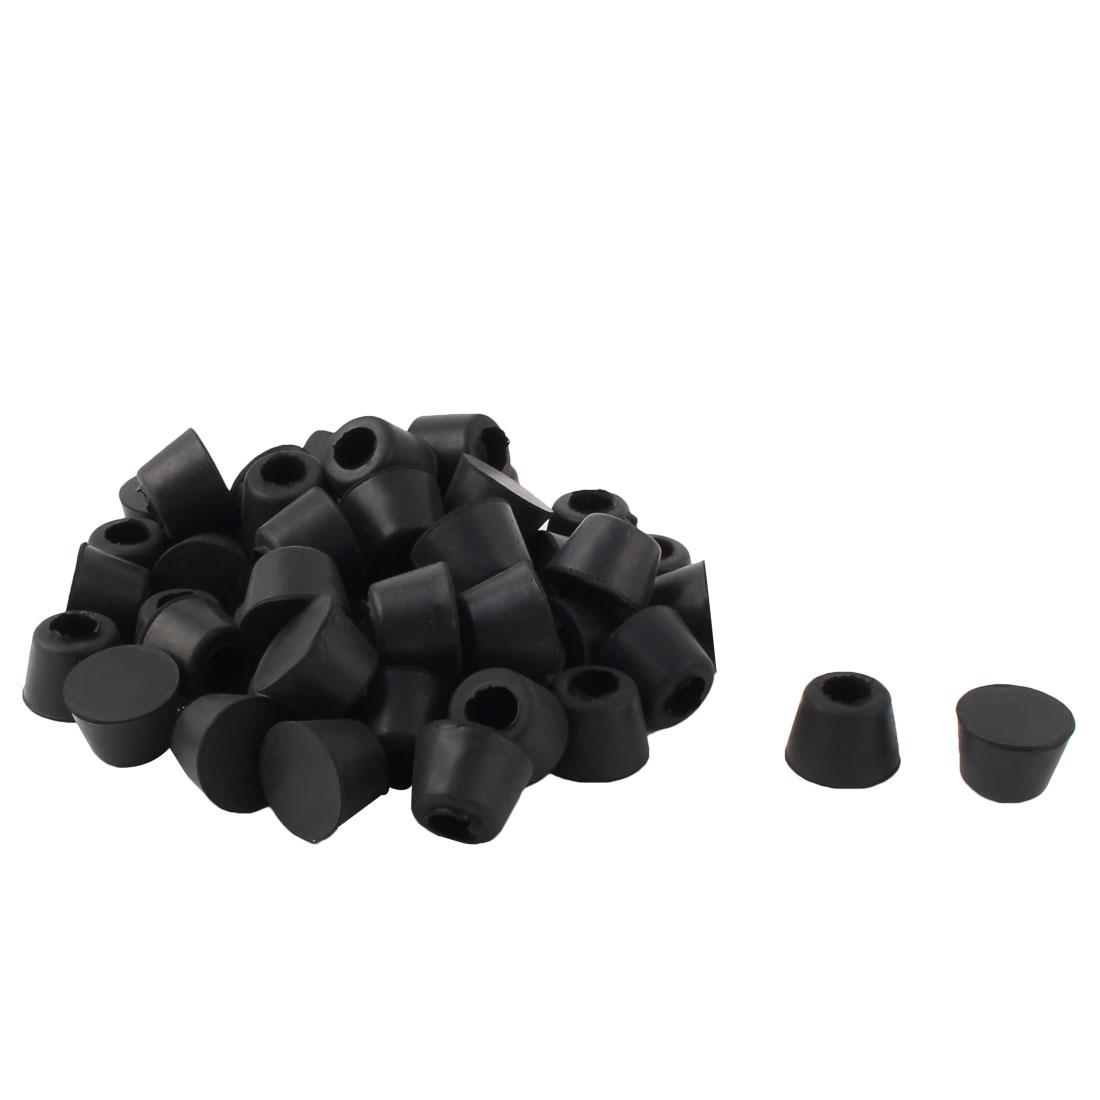 20mm x 27mm x 18mm Amplifier Speaker Instrument Rubber Feet Pad Black 50pcs